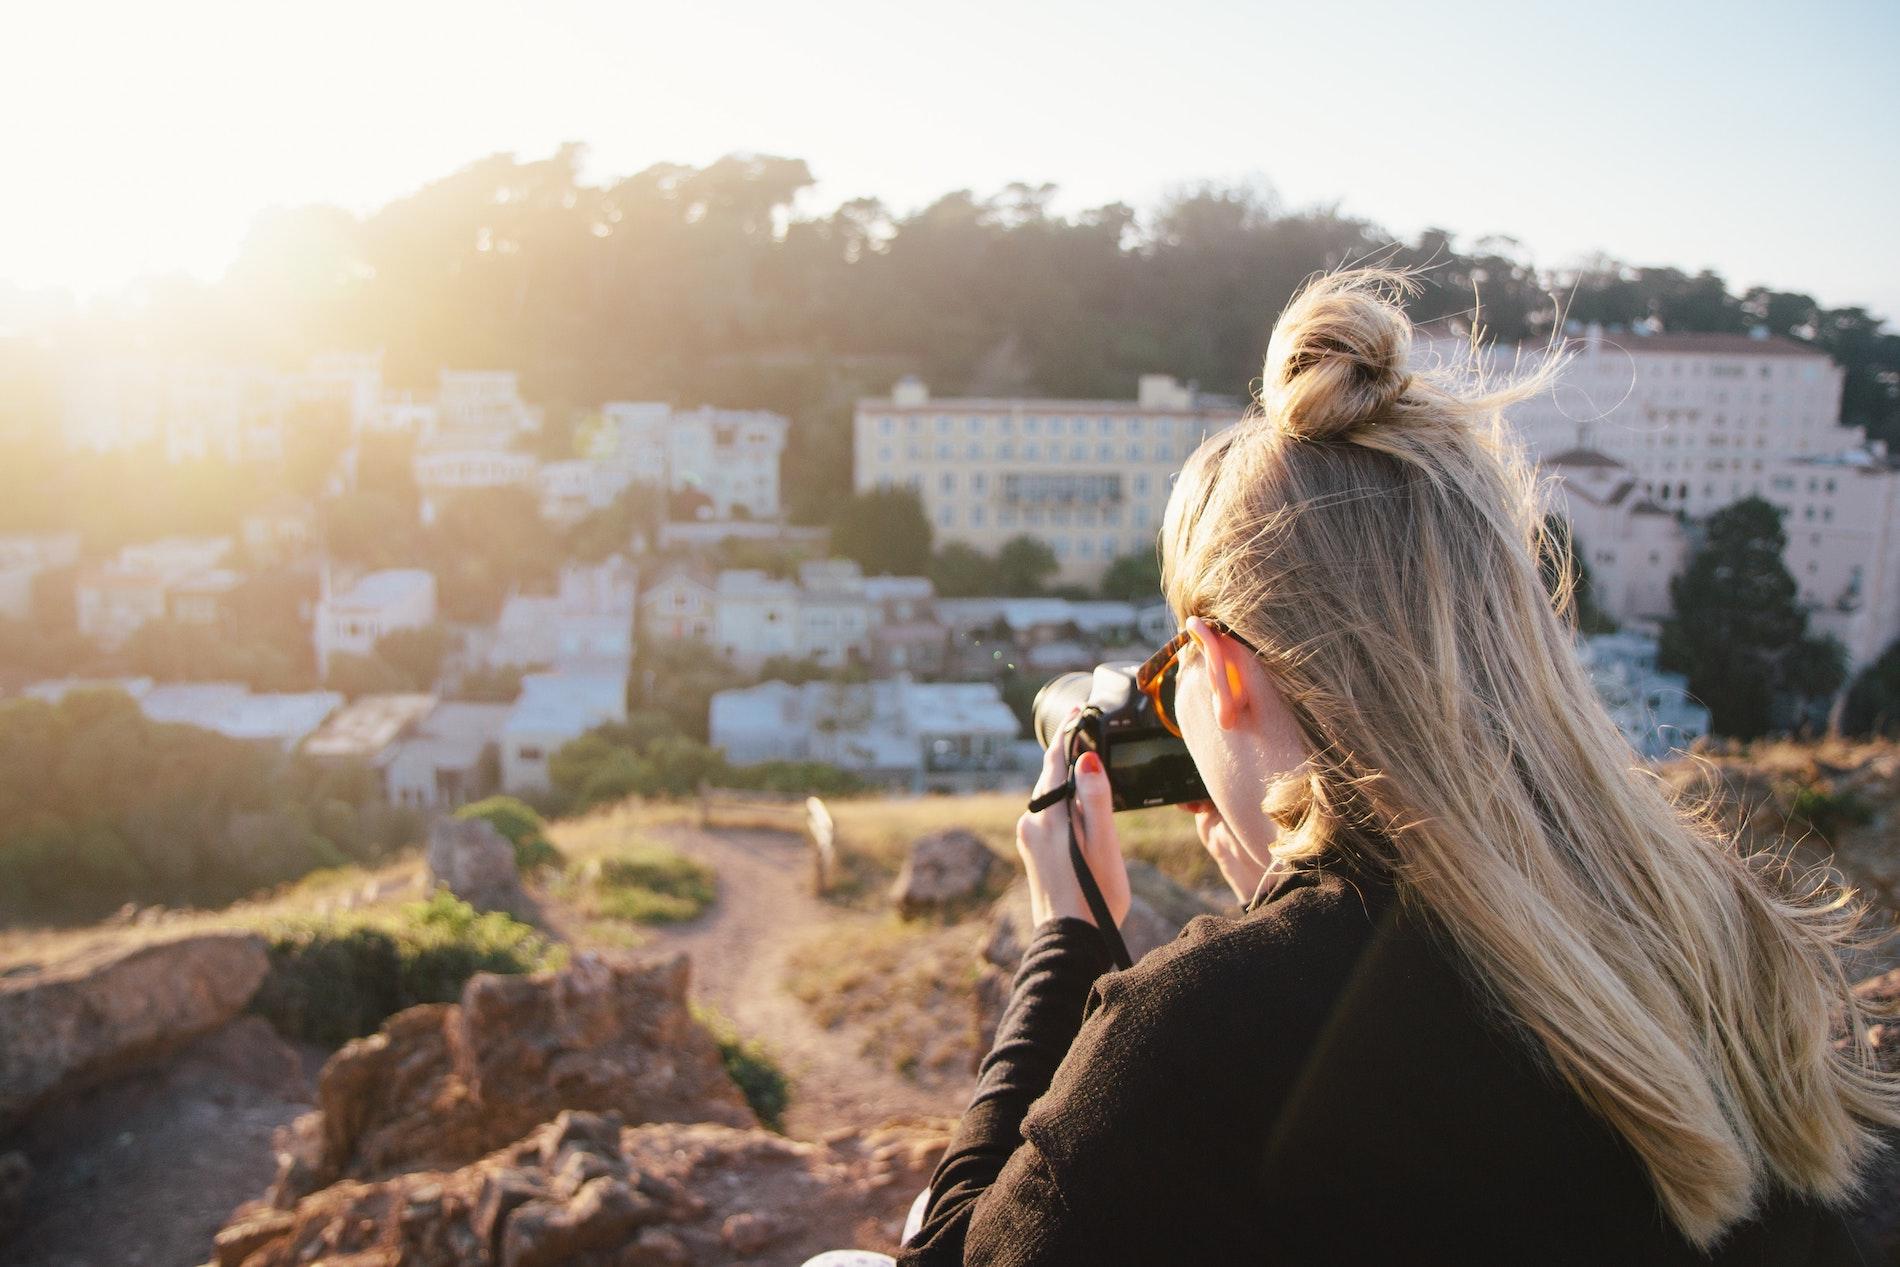 a girl taking a photo facing the sun